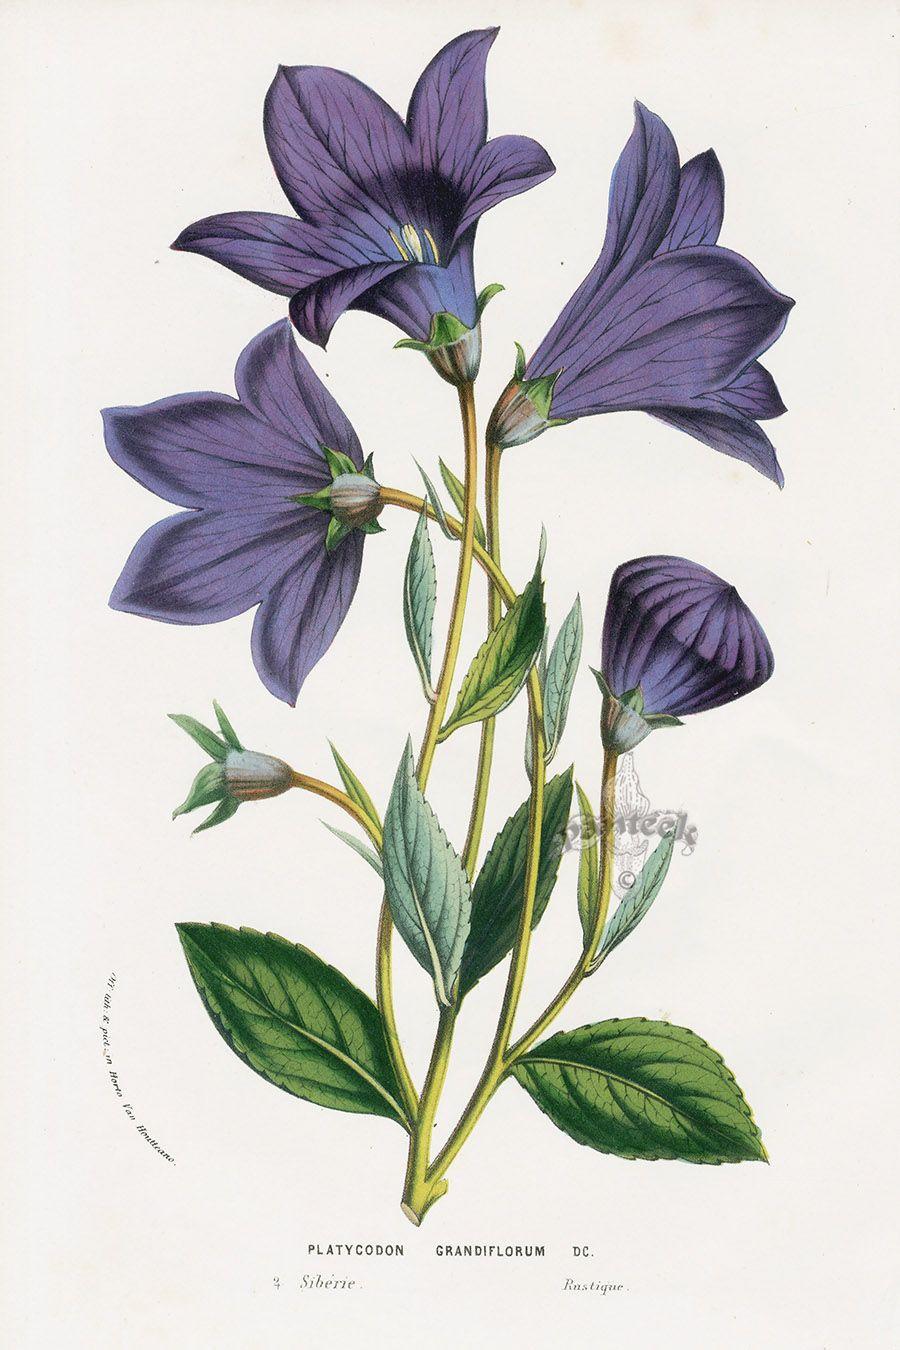 Pin by Nightspore on Botanical Prints Flower art